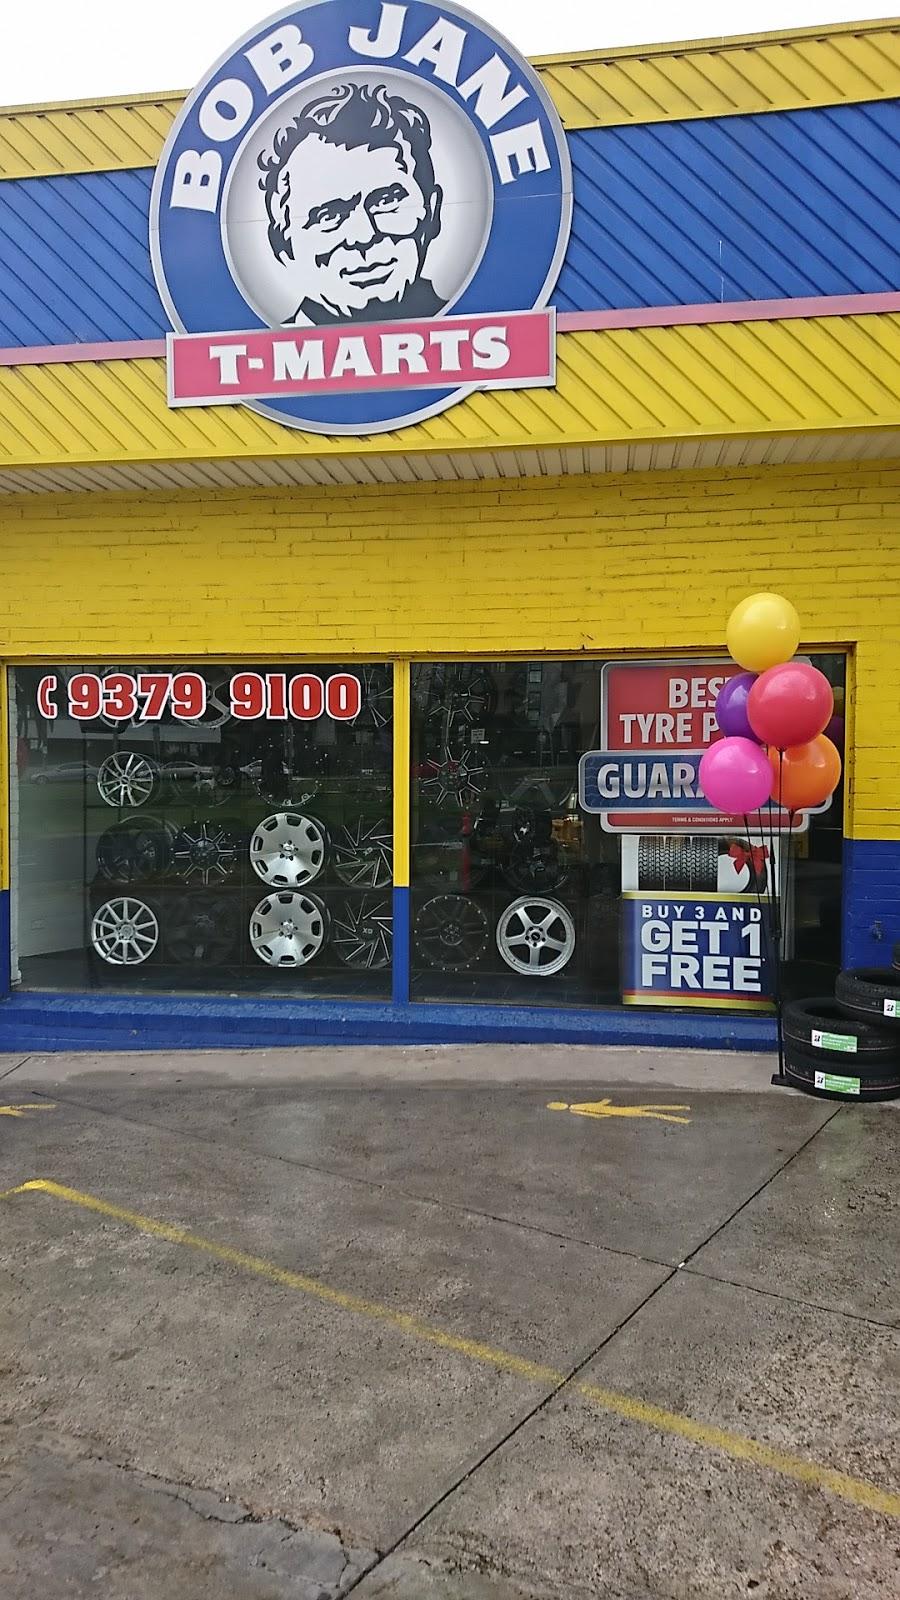 Bob Jane T-Marts | car repair | 981 Mt Alexander Rd, Essendon VIC 3040, Australia | 0393799100 OR +61 3 9379 9100